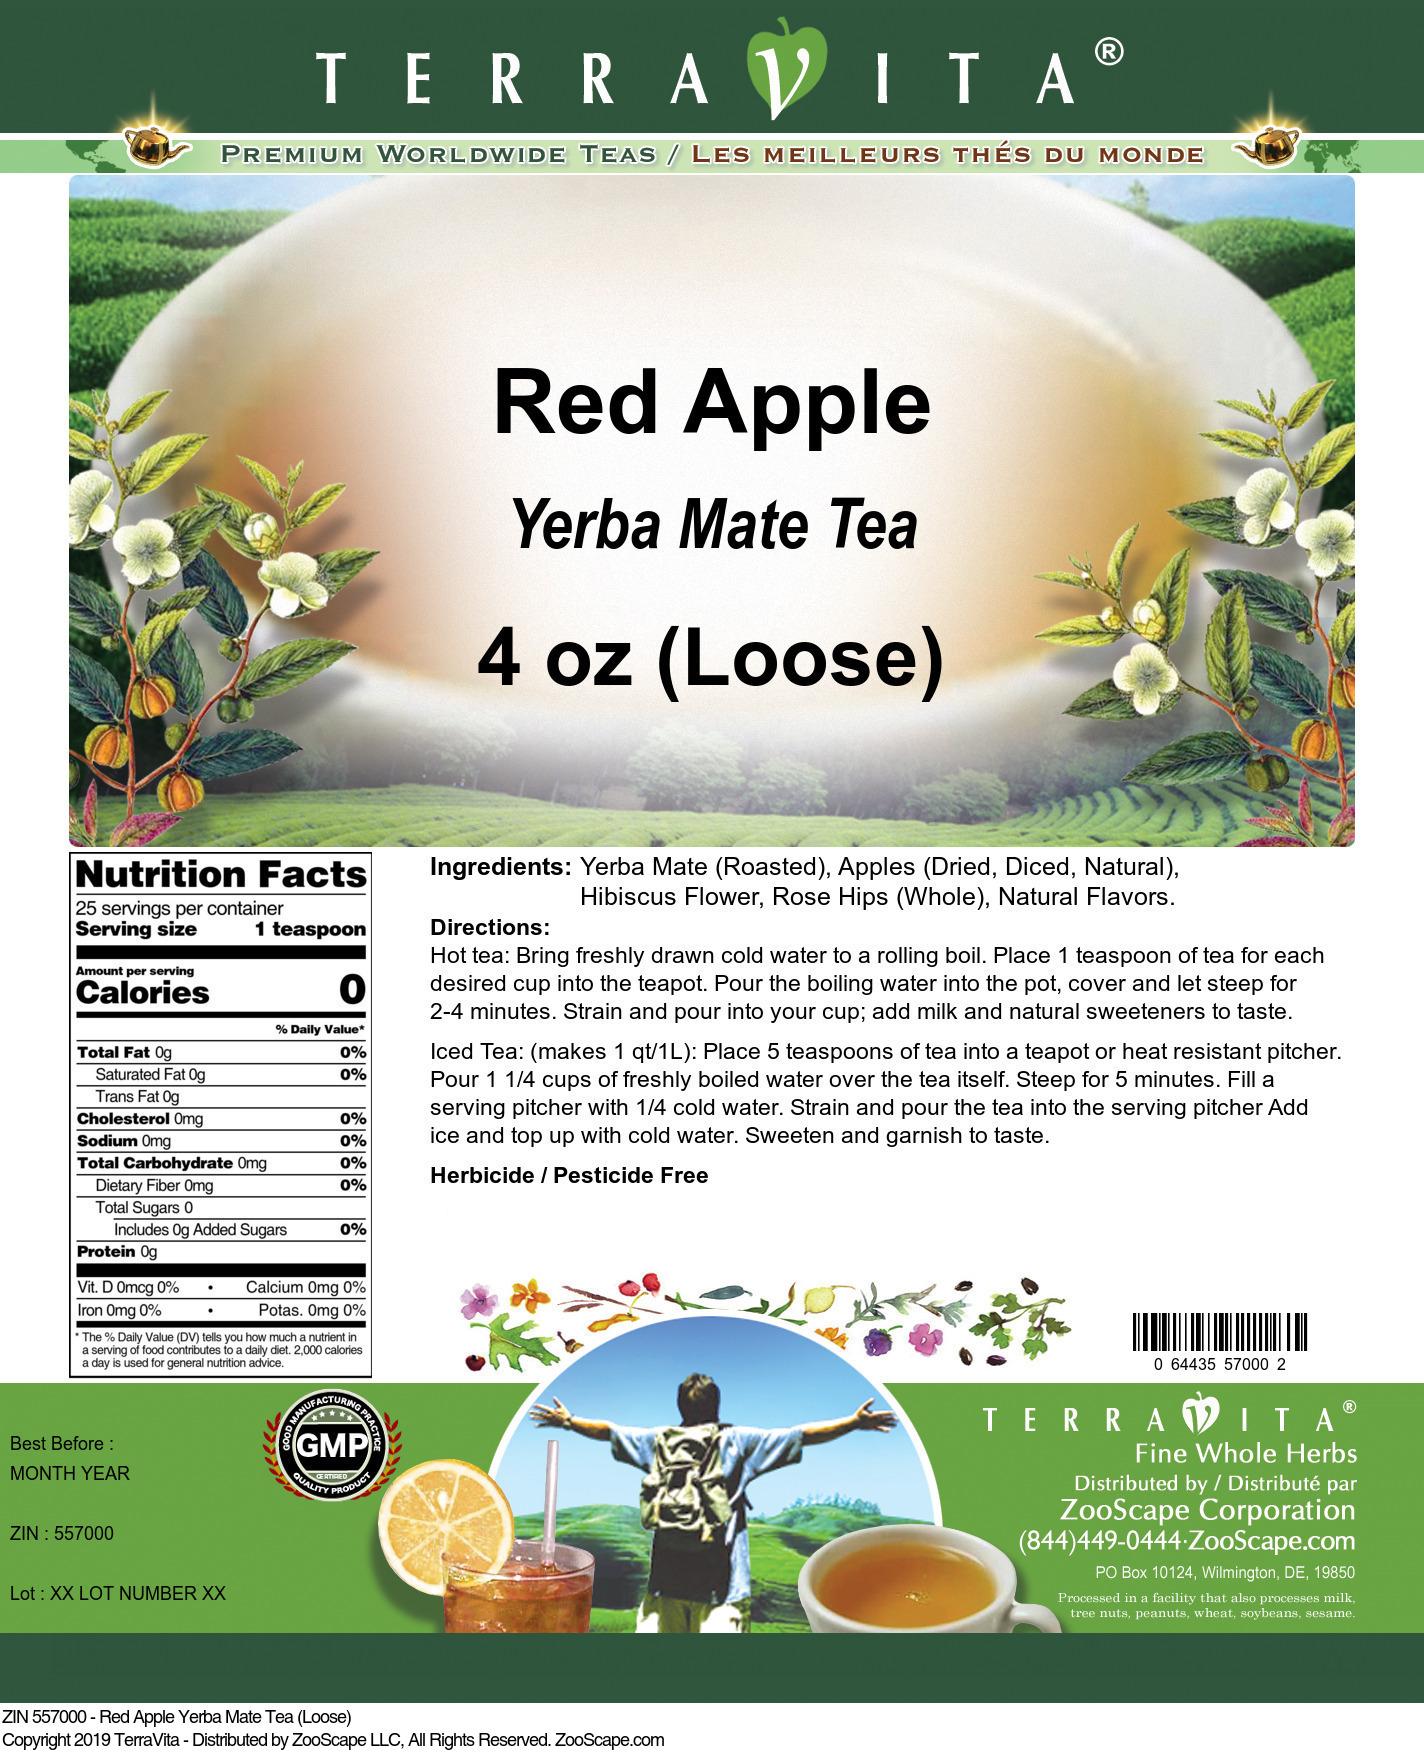 Red Apple Yerba Mate